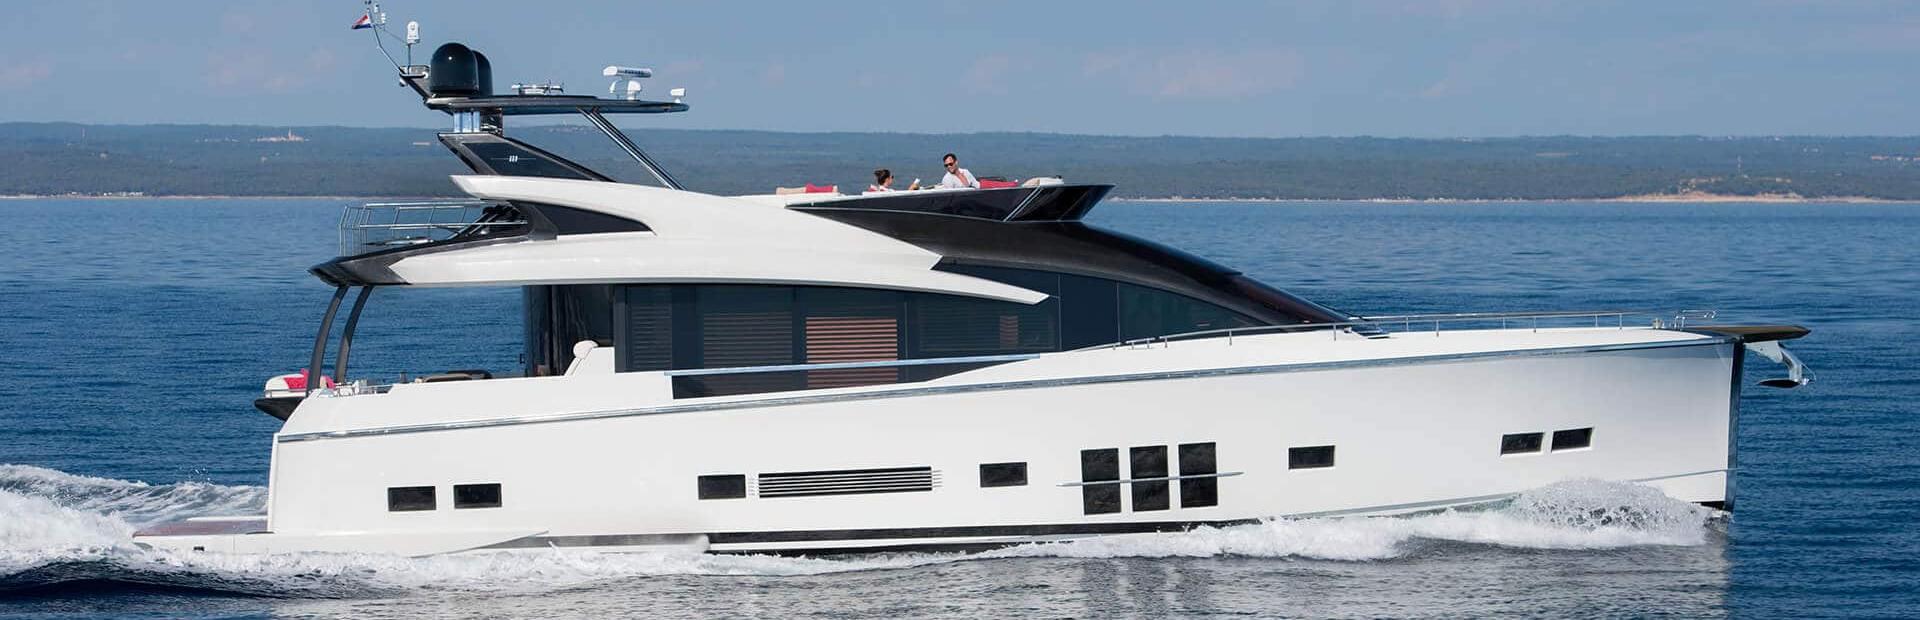 Adler Yacht  Profile Photo